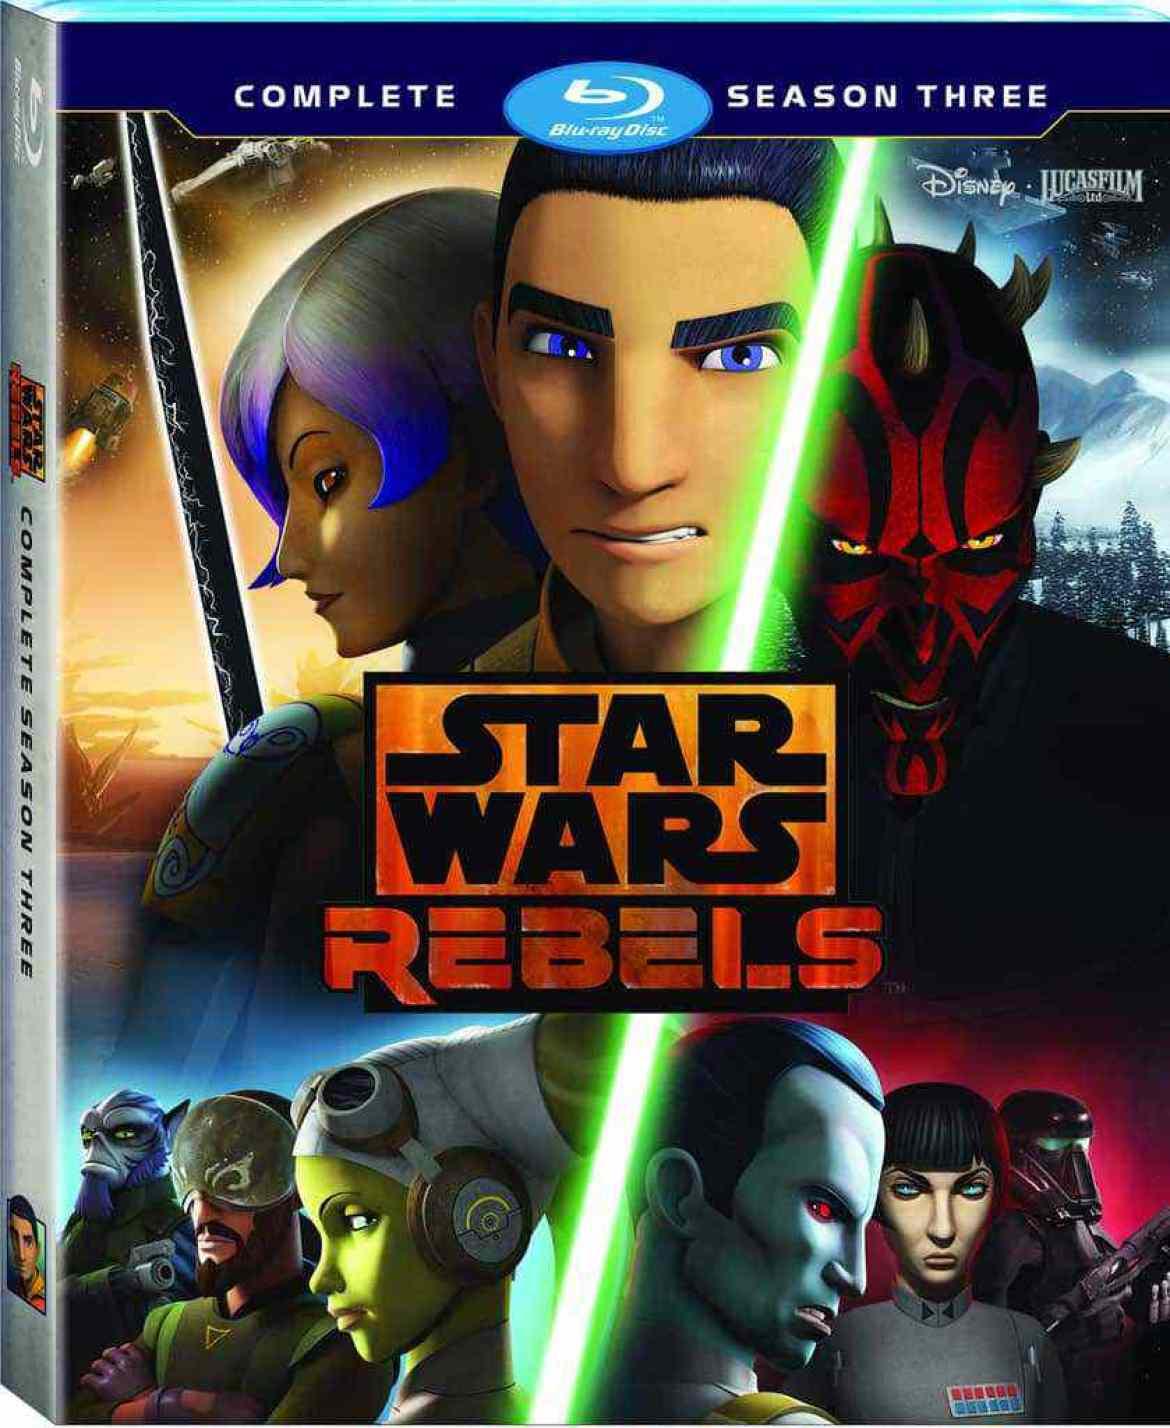 Star Wars Rebels  Complete Season Three Home Video ReleasePrintBeauty Shots6.75 Blu rayWorldwideRAP - Press Release: Star Wars Rebels: Complete Season Three Blu-ray!